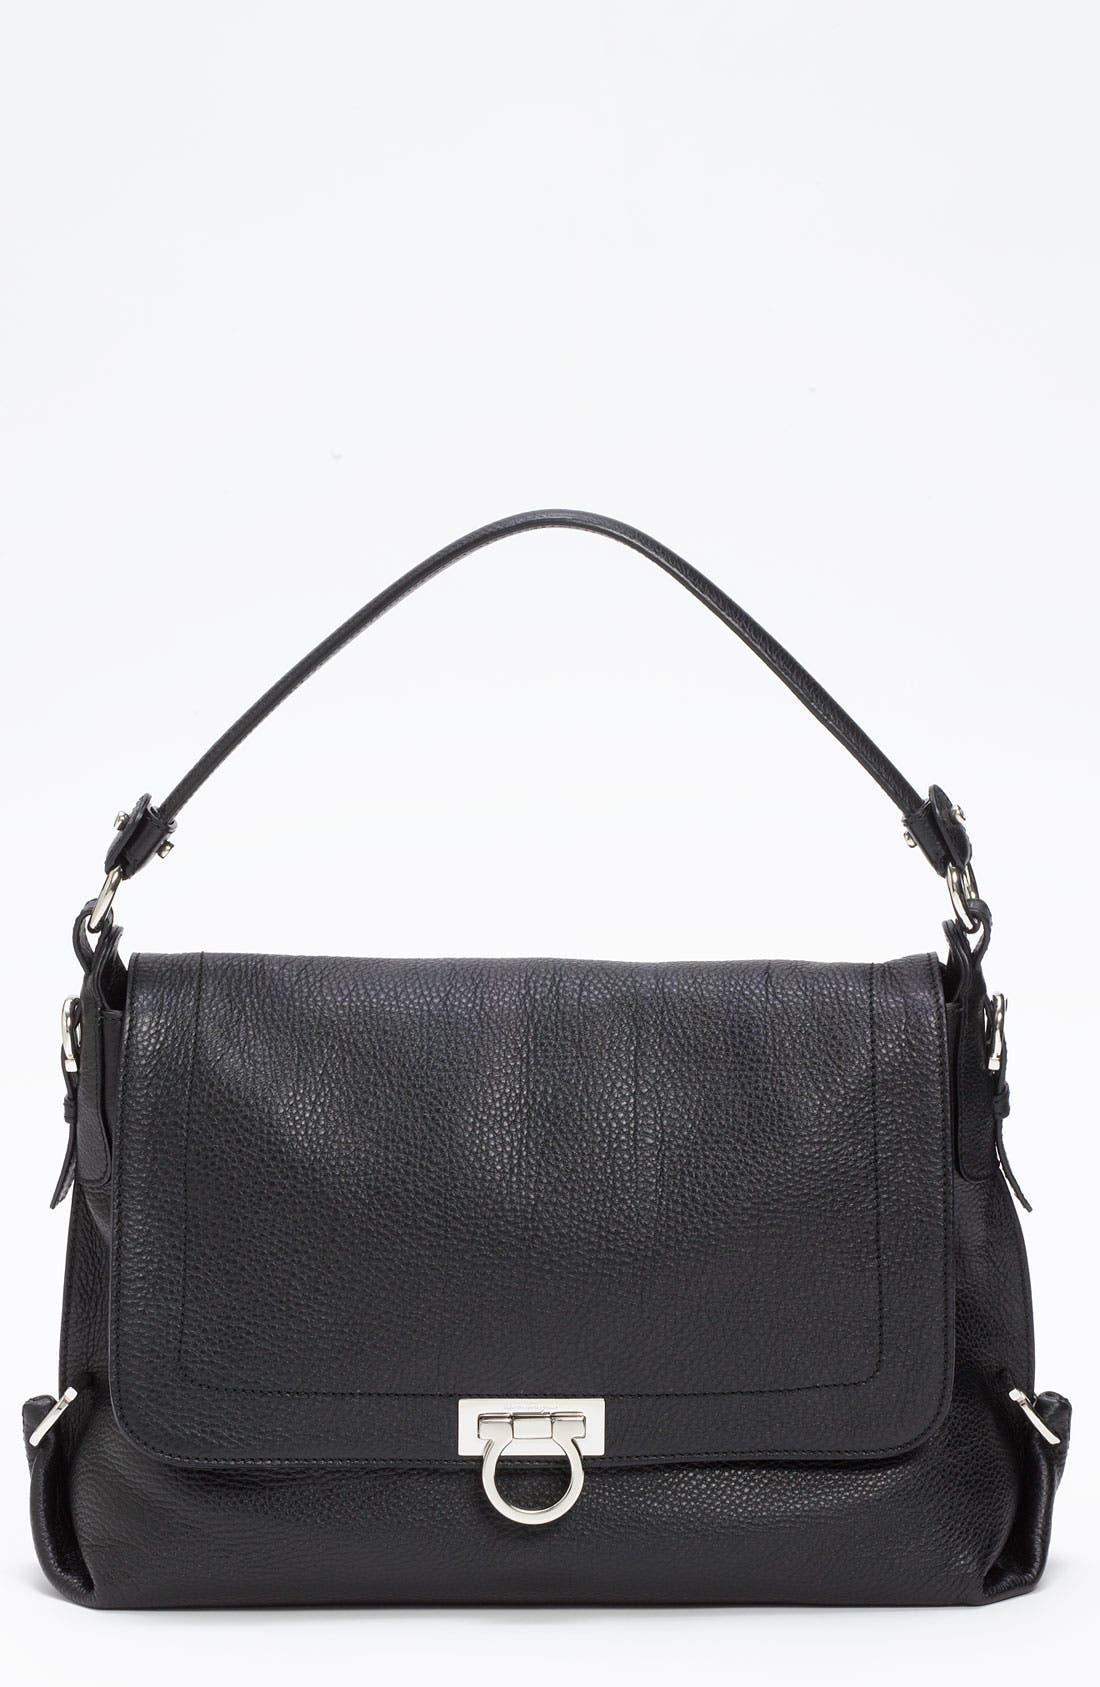 Alternate Image 1 Selected - Salvatore Ferragamo 'Avye' Leather Shoulder Bag